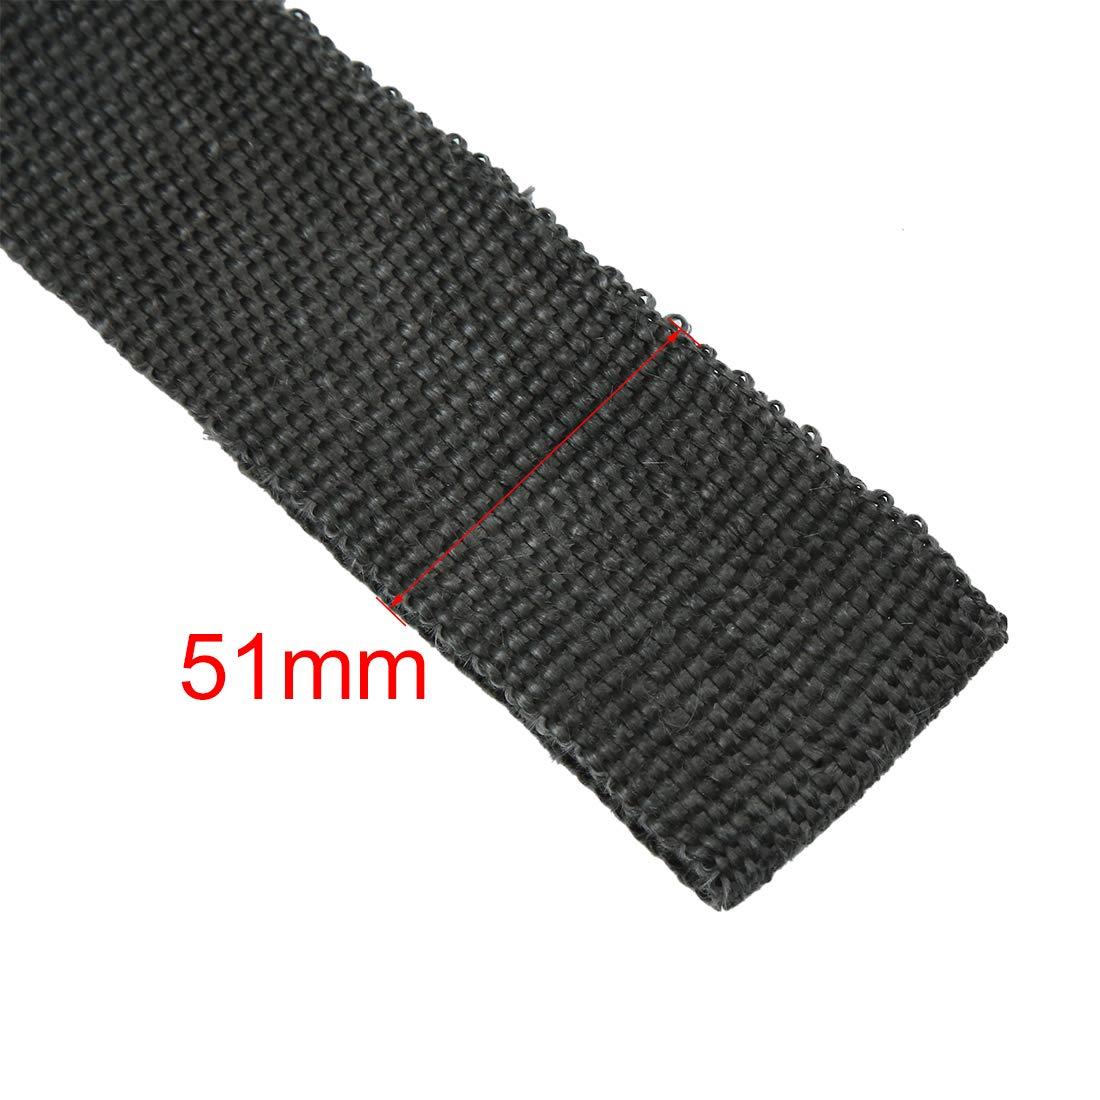 X AUTOHAUX 7.5m Black Fiberglass Exhaust Heat Insulating Wrap Repairing Sealing Tape for Car